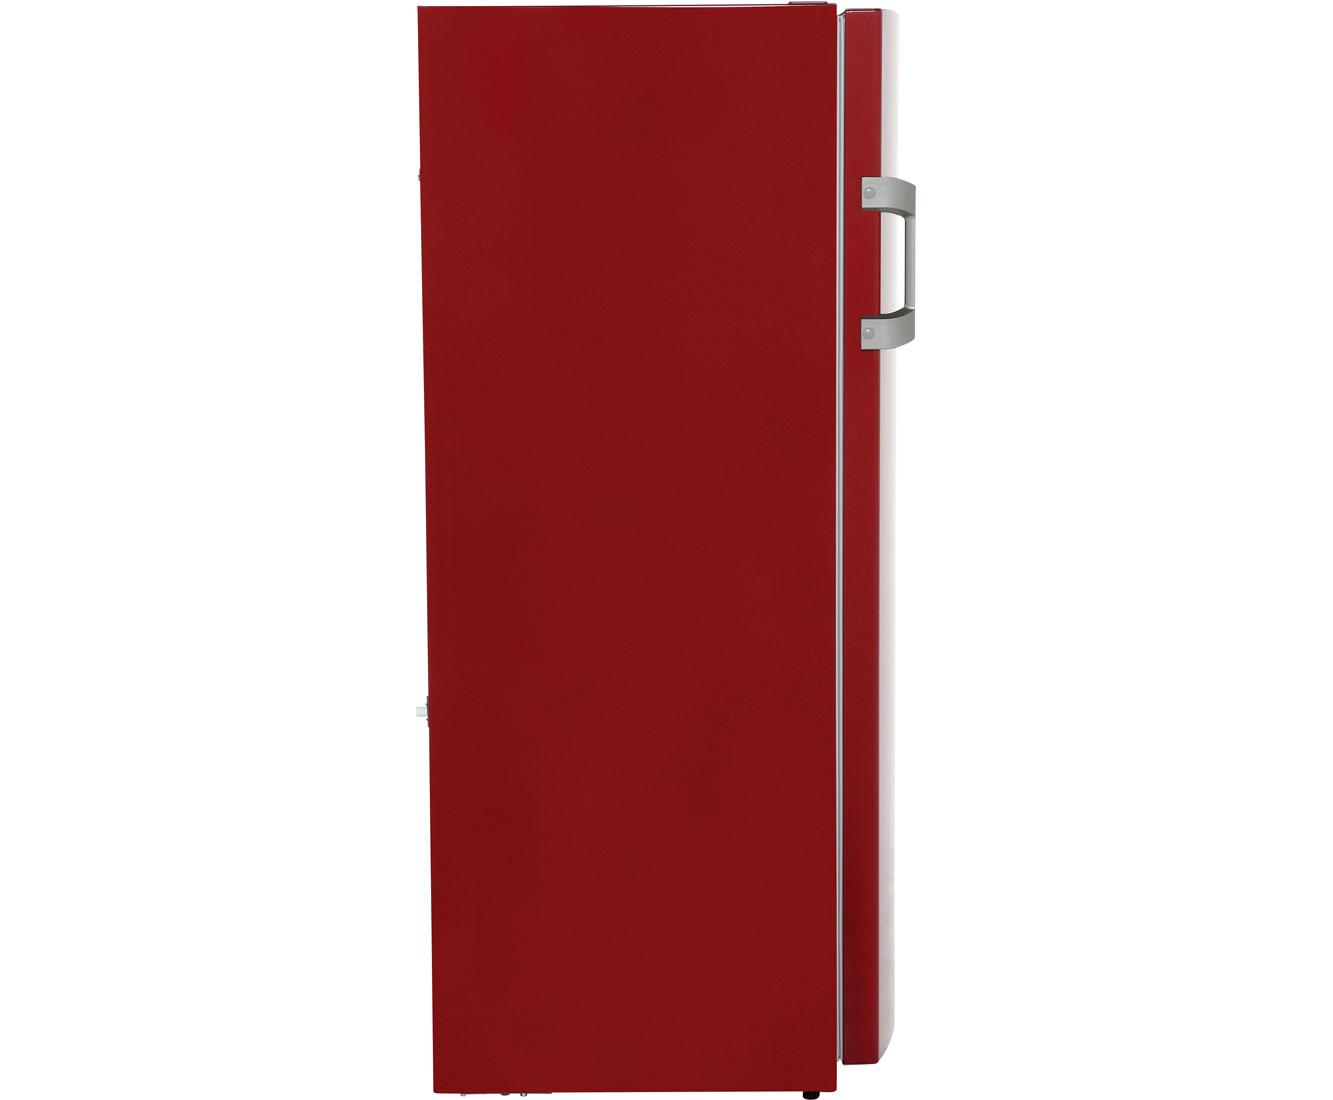 Gorenje Kühlschrank B Ware : Gorenje r bx kühlschrank freistehend cm edelstahl neu ebay